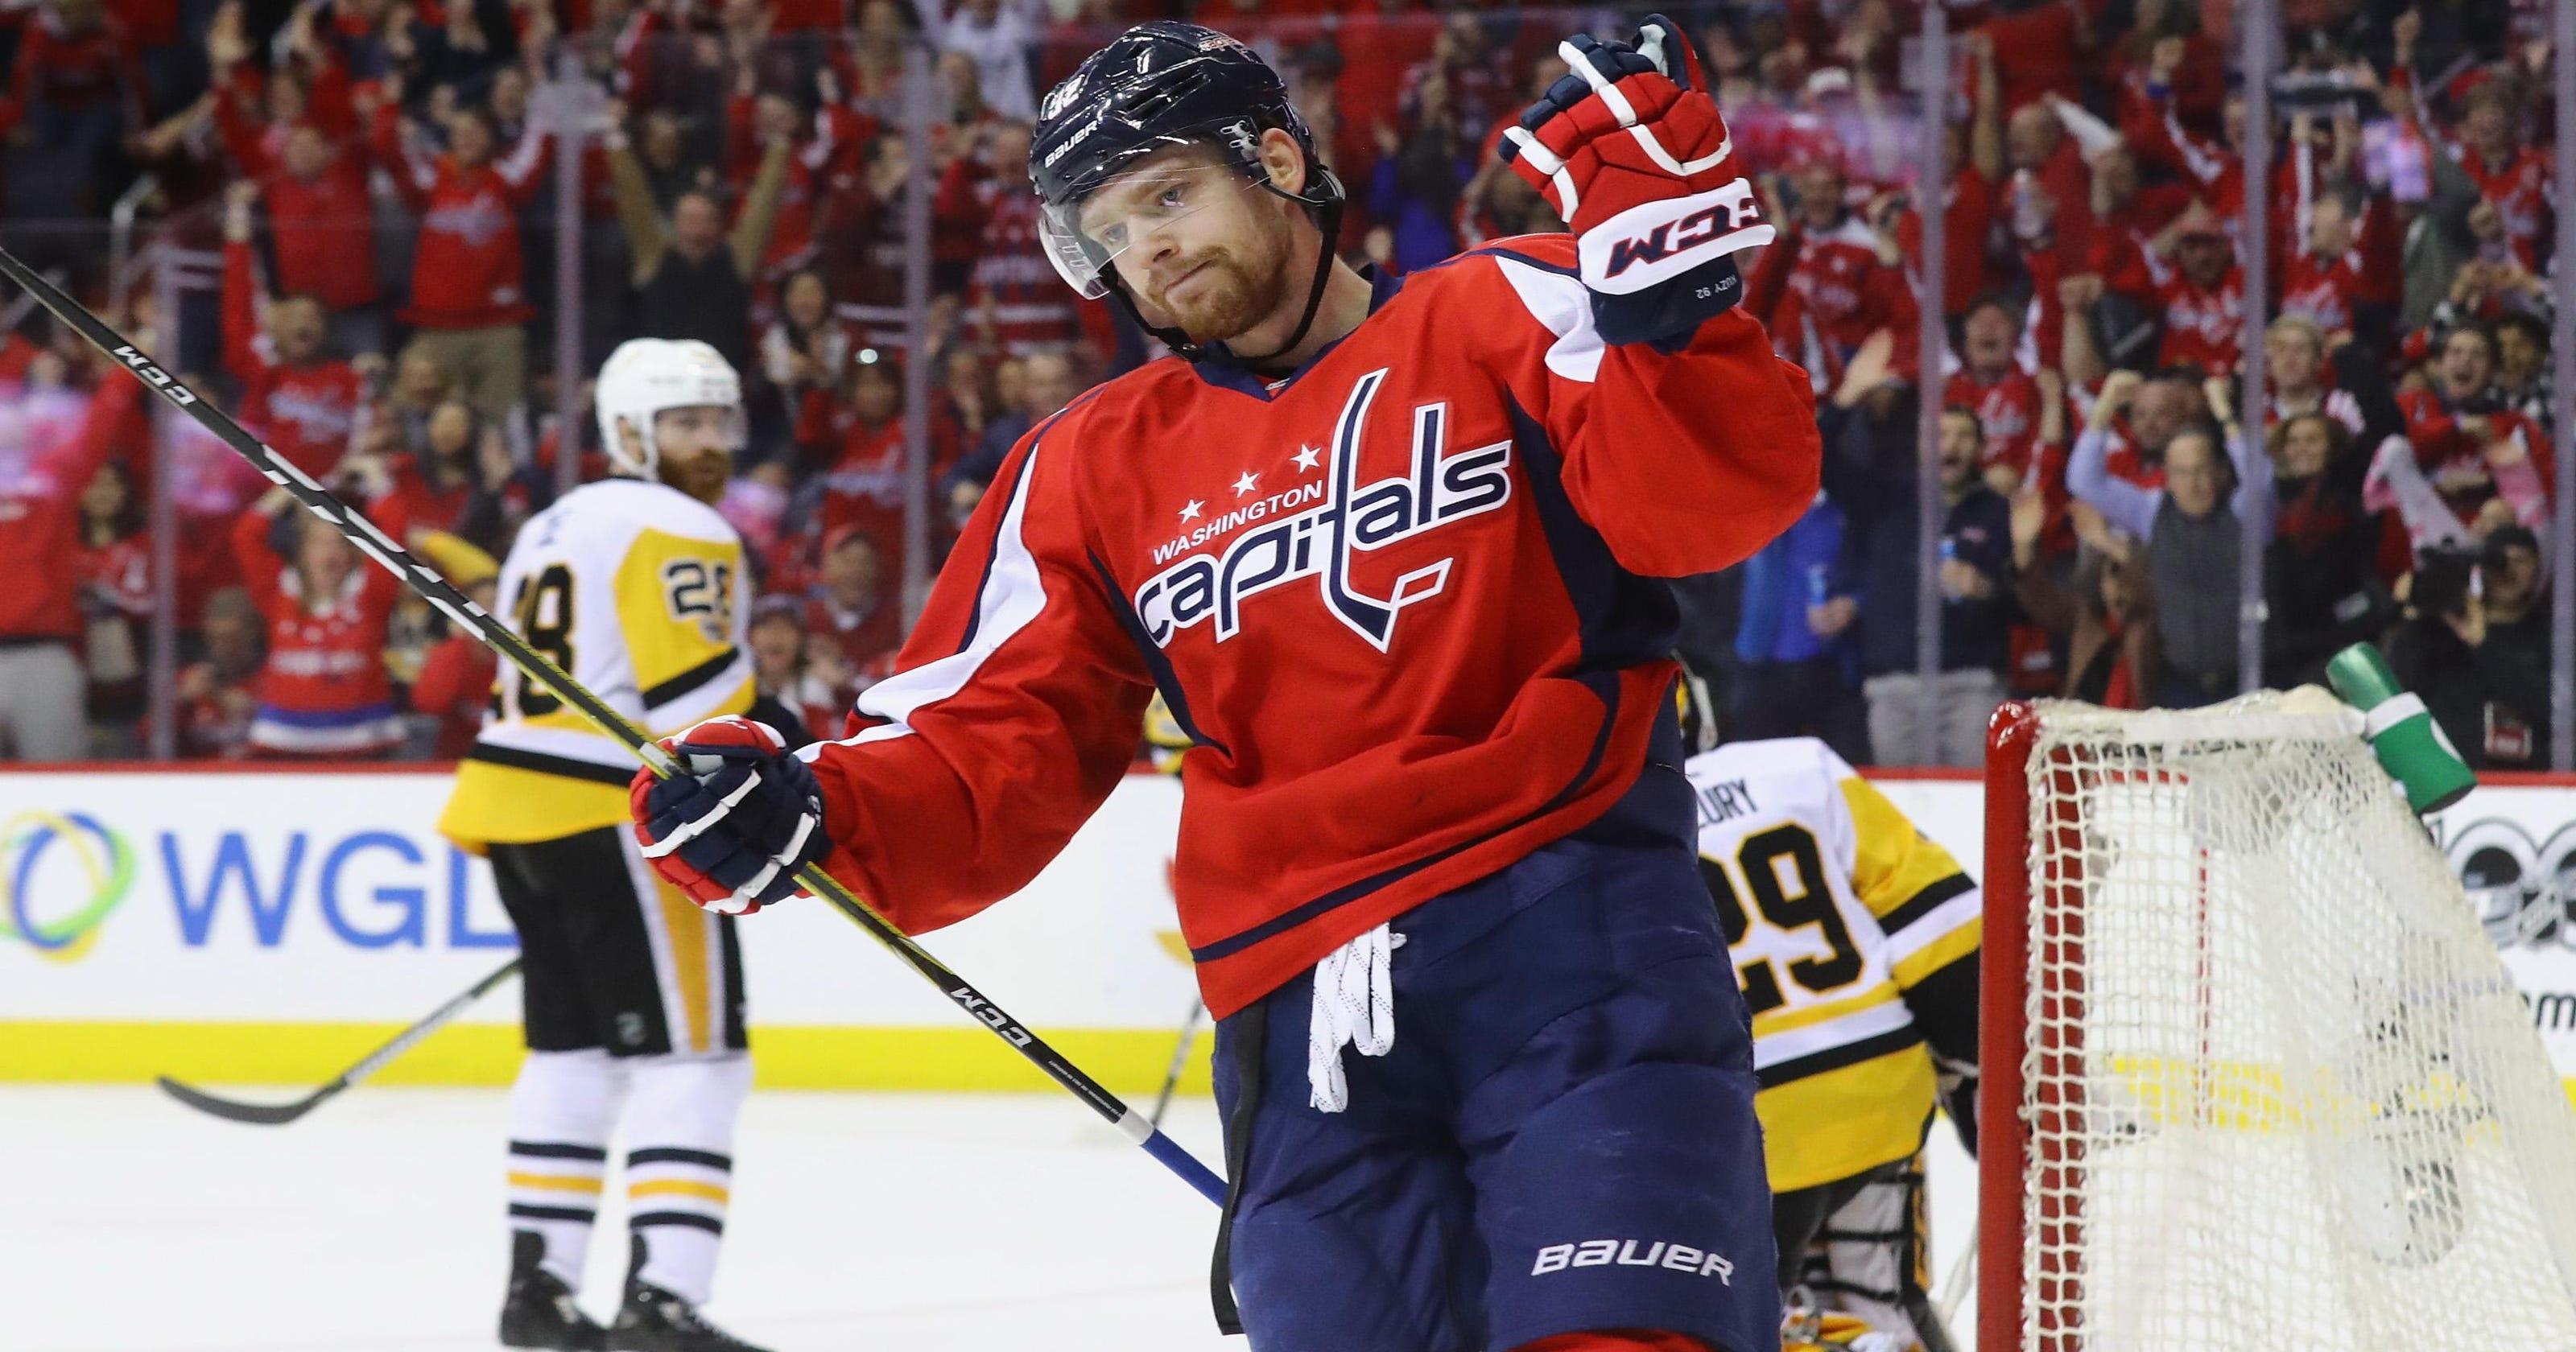 Saturday s NHL playoffs  Caps rally past Pens c4d0064dec5f